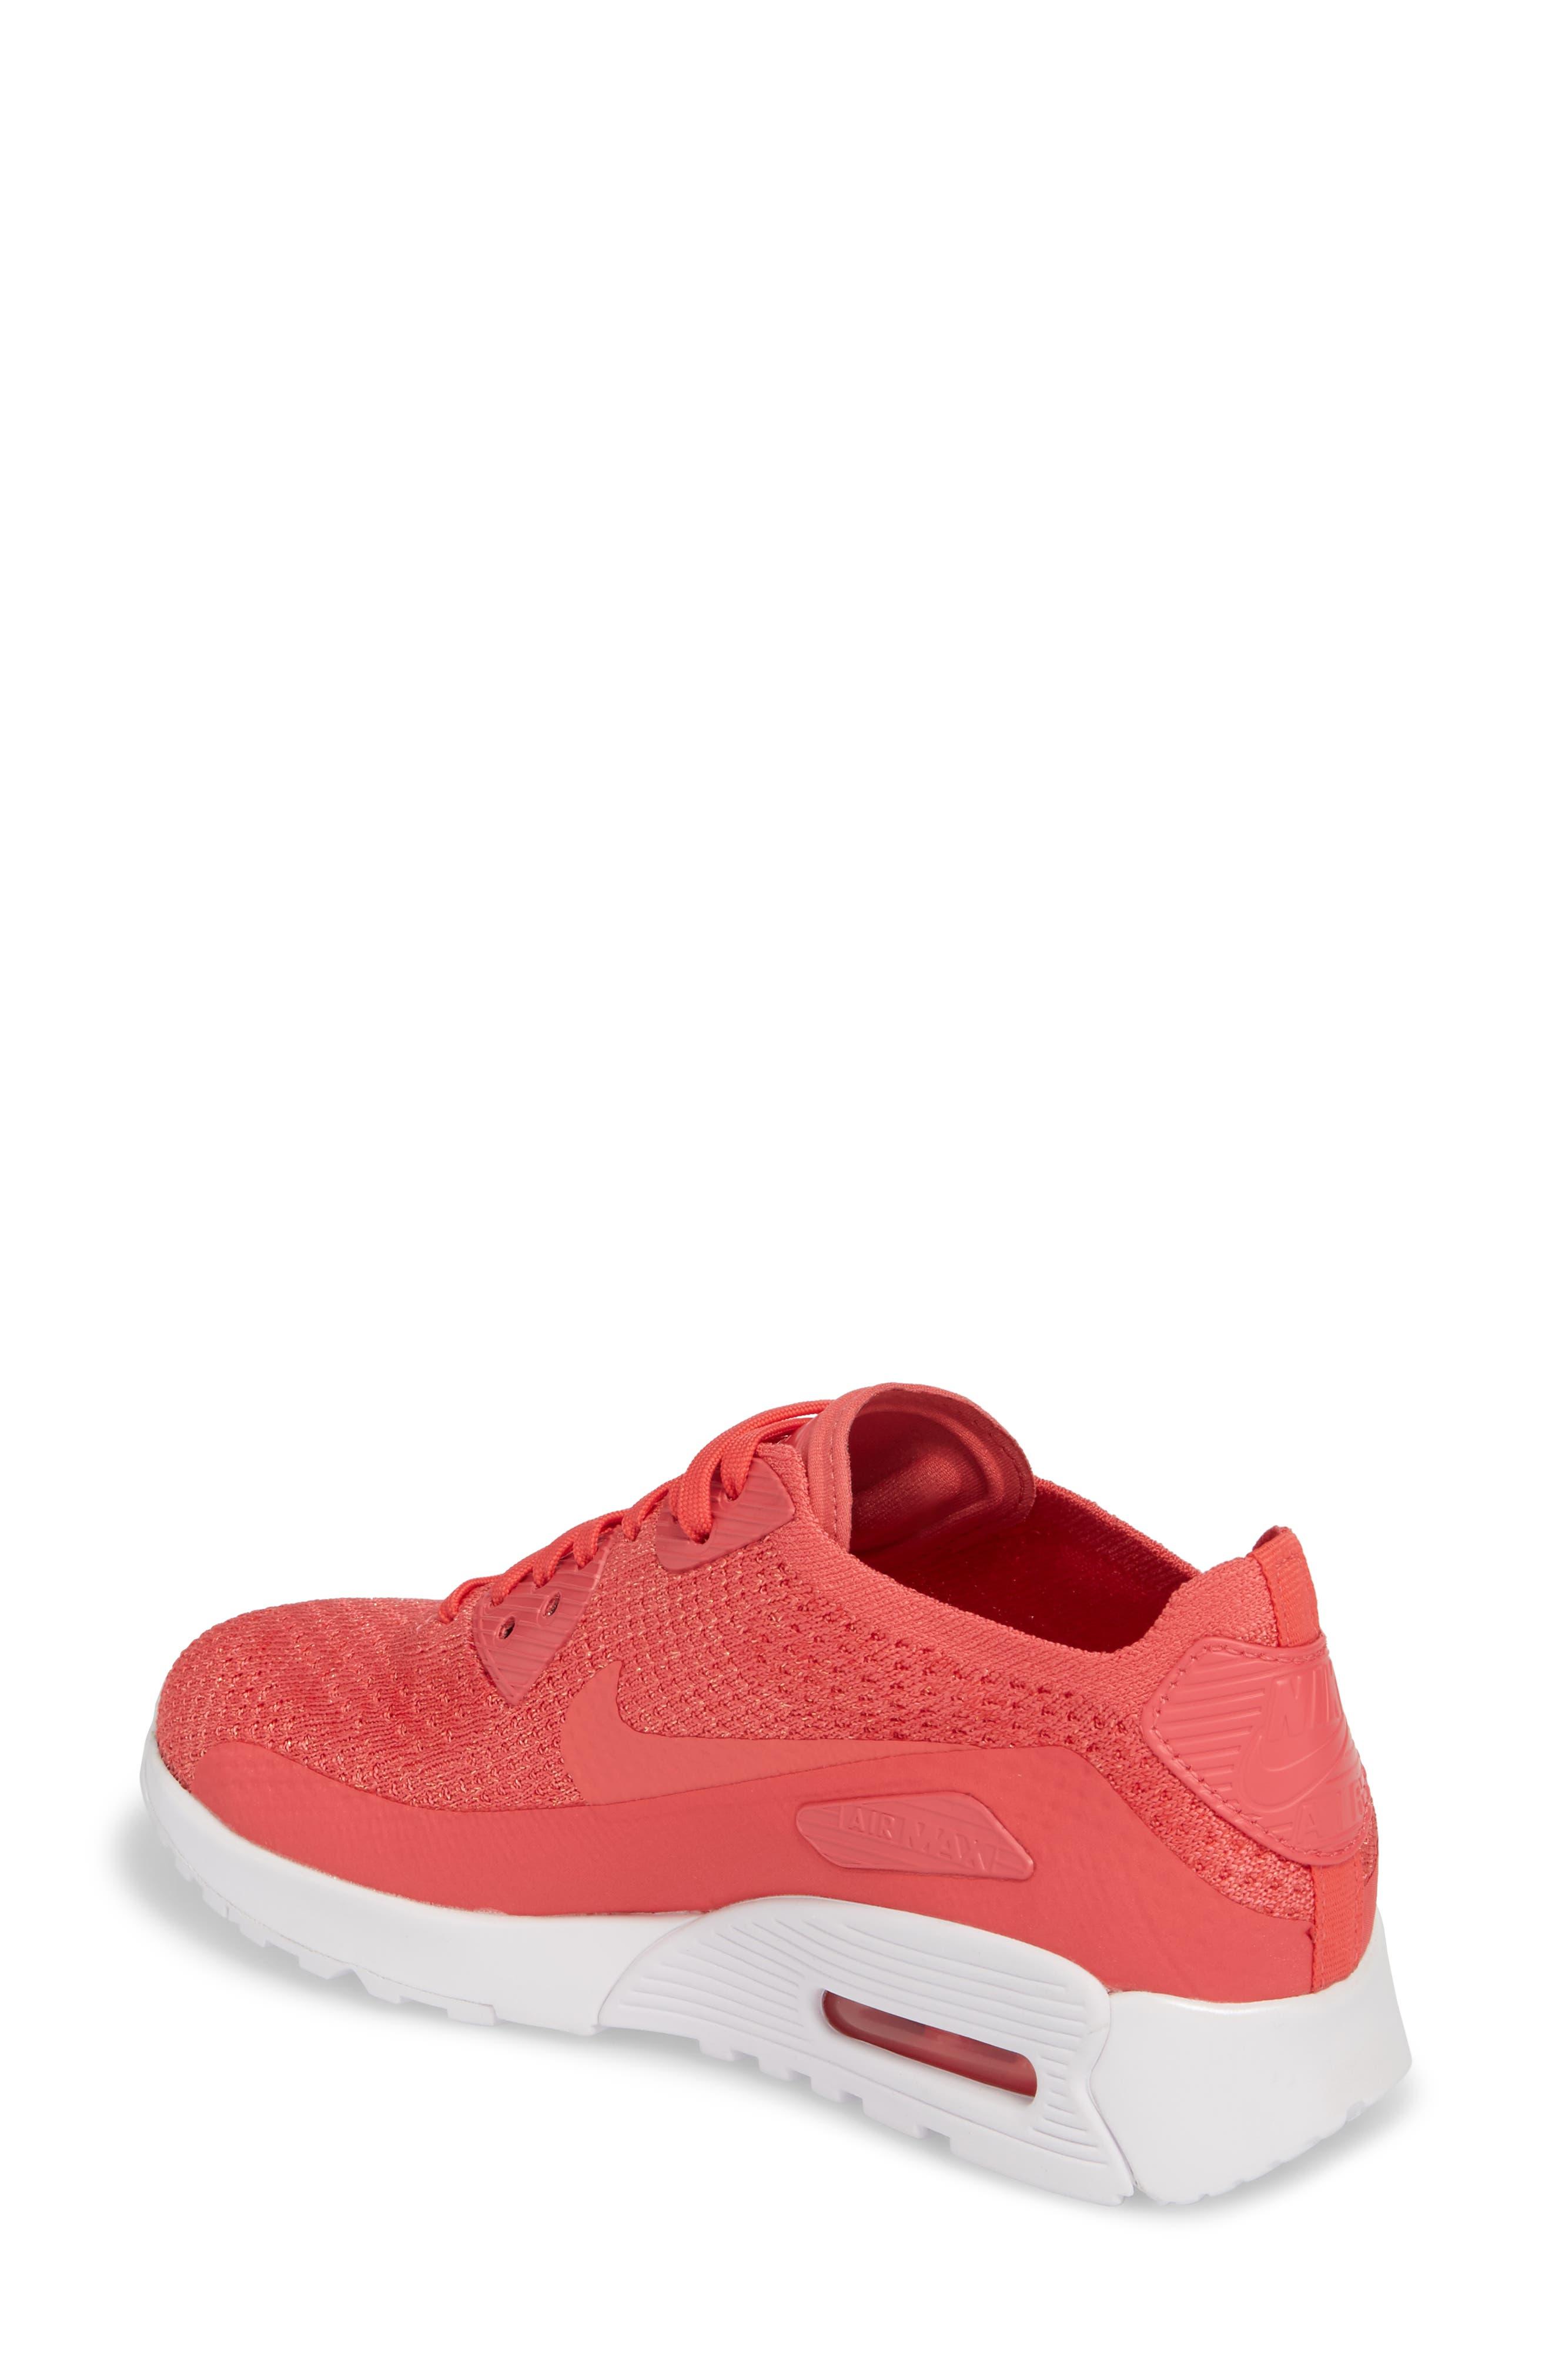 Air Max 90 Flyknit Ultra 2.0 Sneaker,                             Alternate thumbnail 2, color,                             Geranium/ Geranium